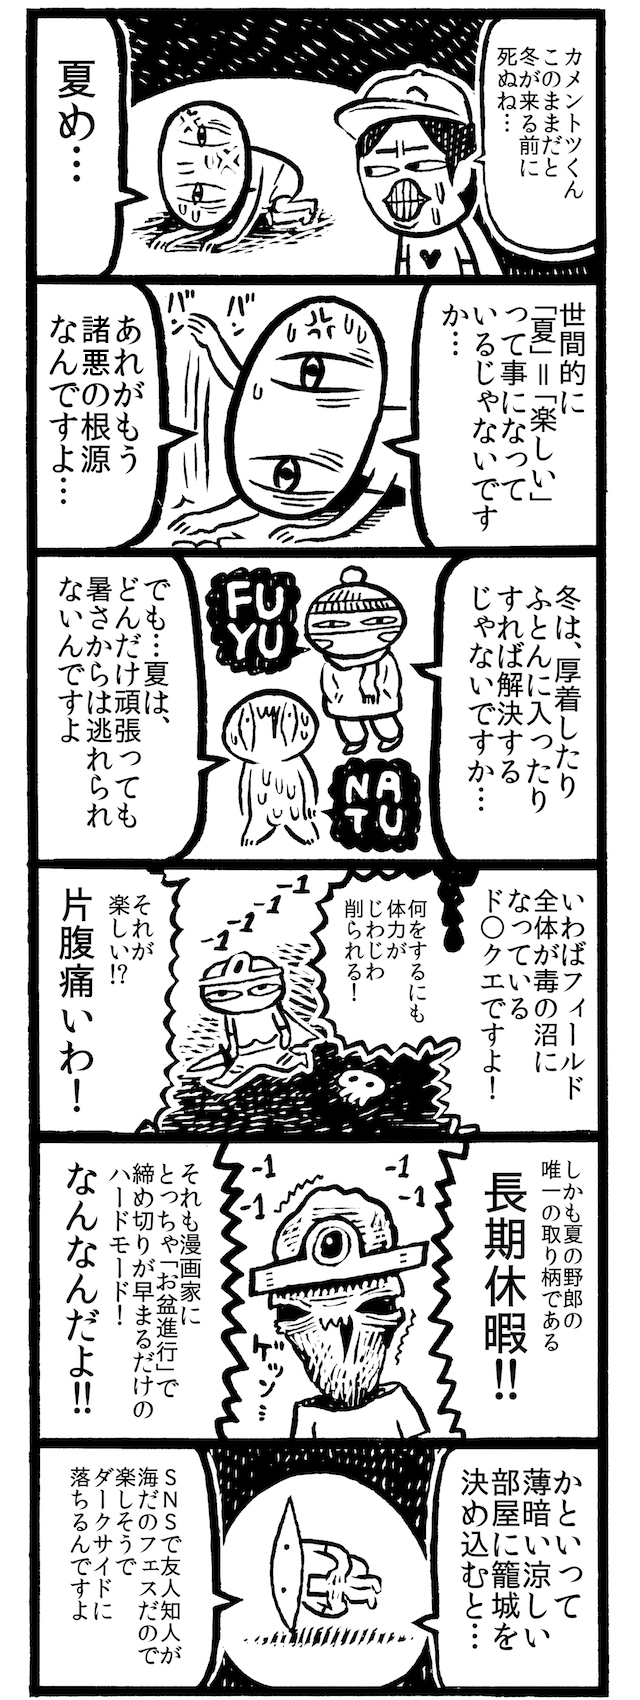 f:id:ryo_kato:20160913103335j:plain